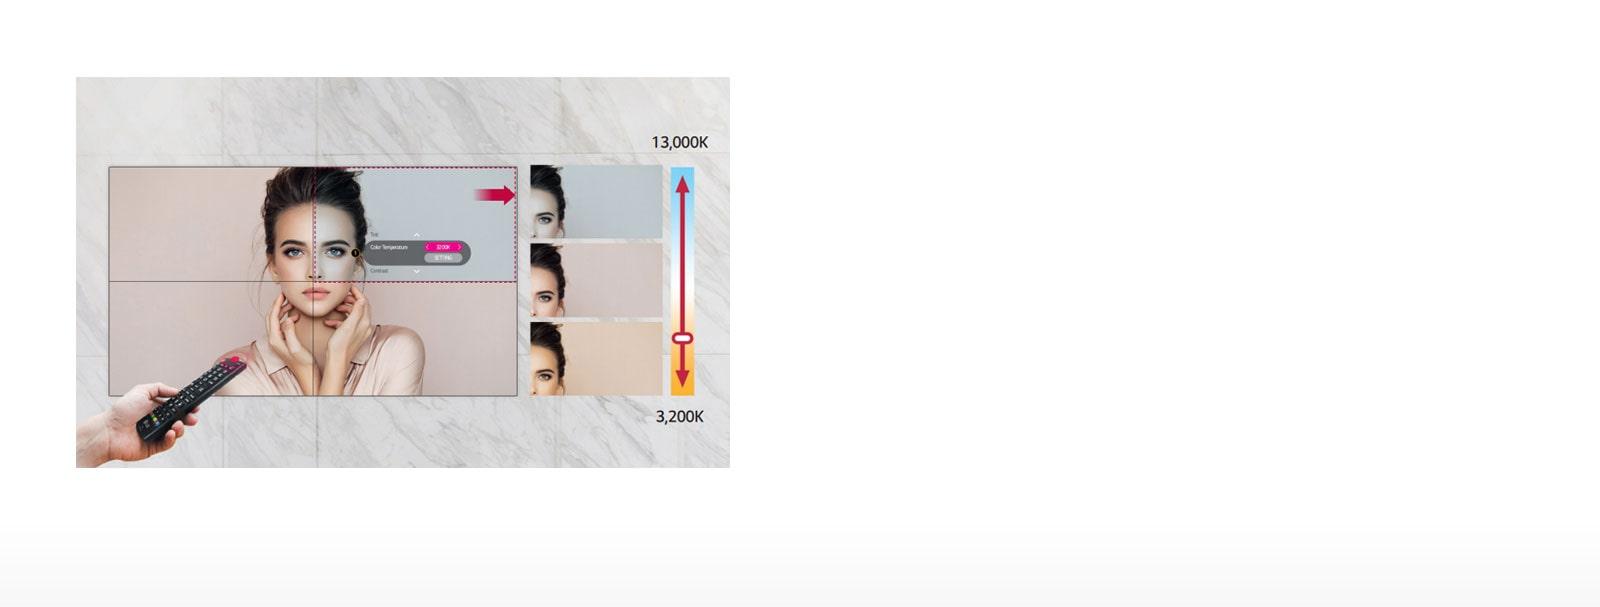 ID-Digital Signage-Video Wall-49VL7F-06-Easy Color Adjustment_1558318461468